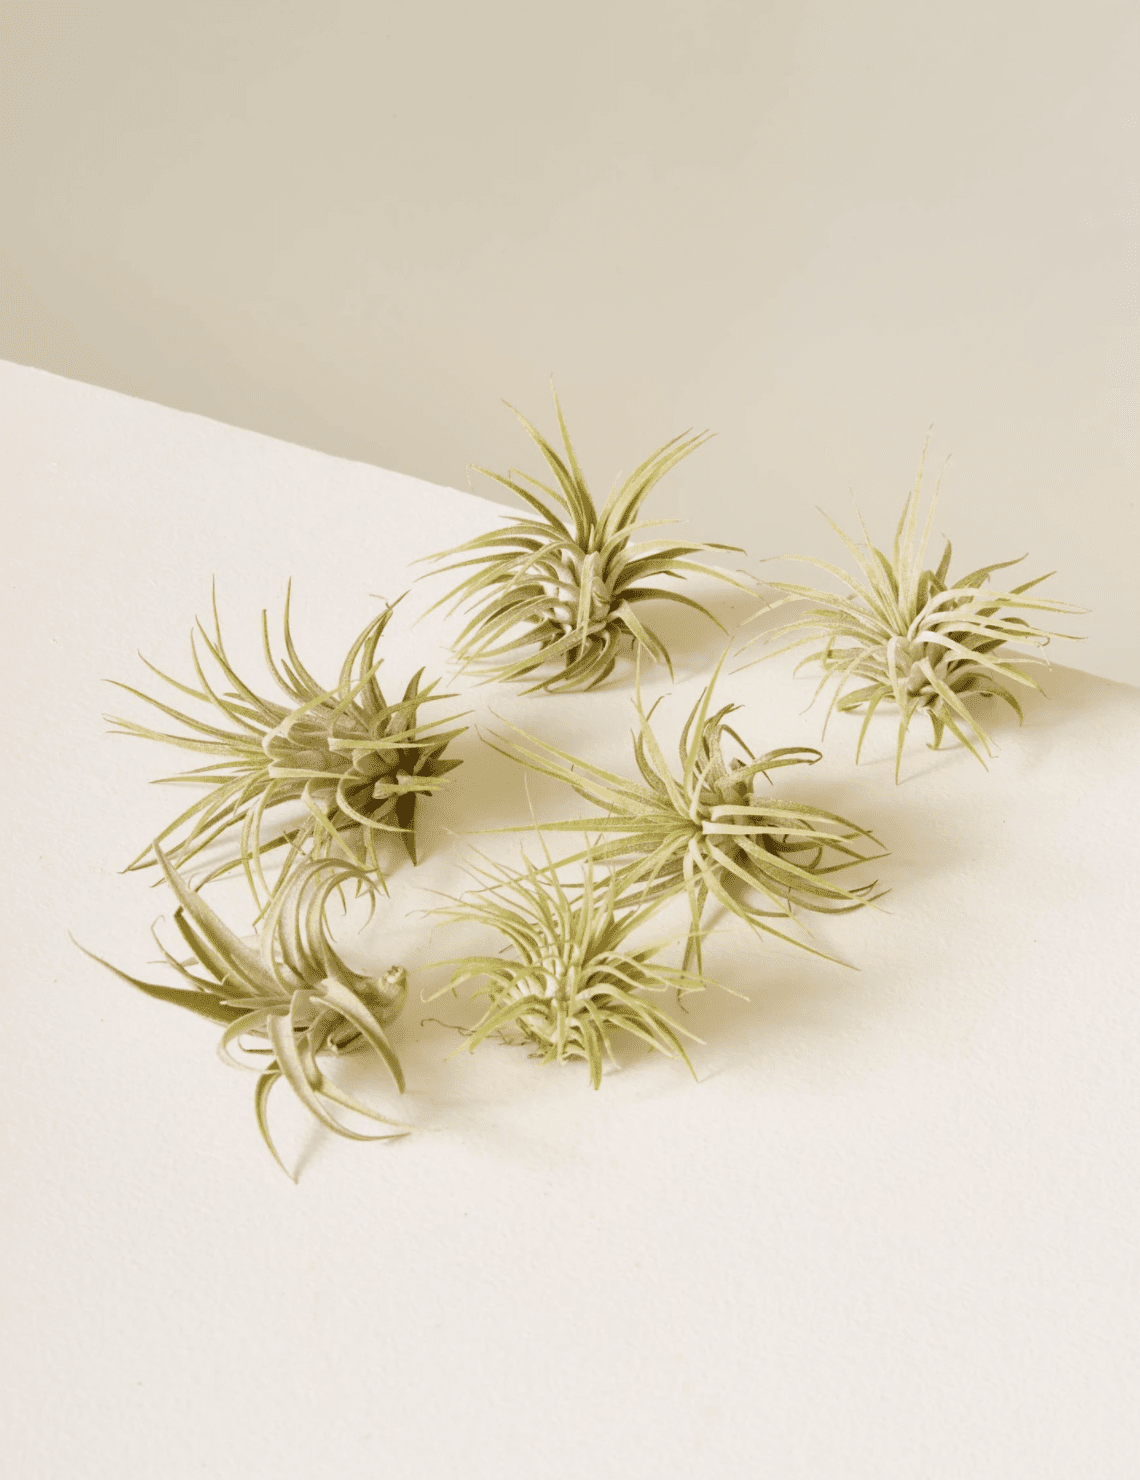 THE SILL / BROMELIAD AIR PLANT ASSORTMENT